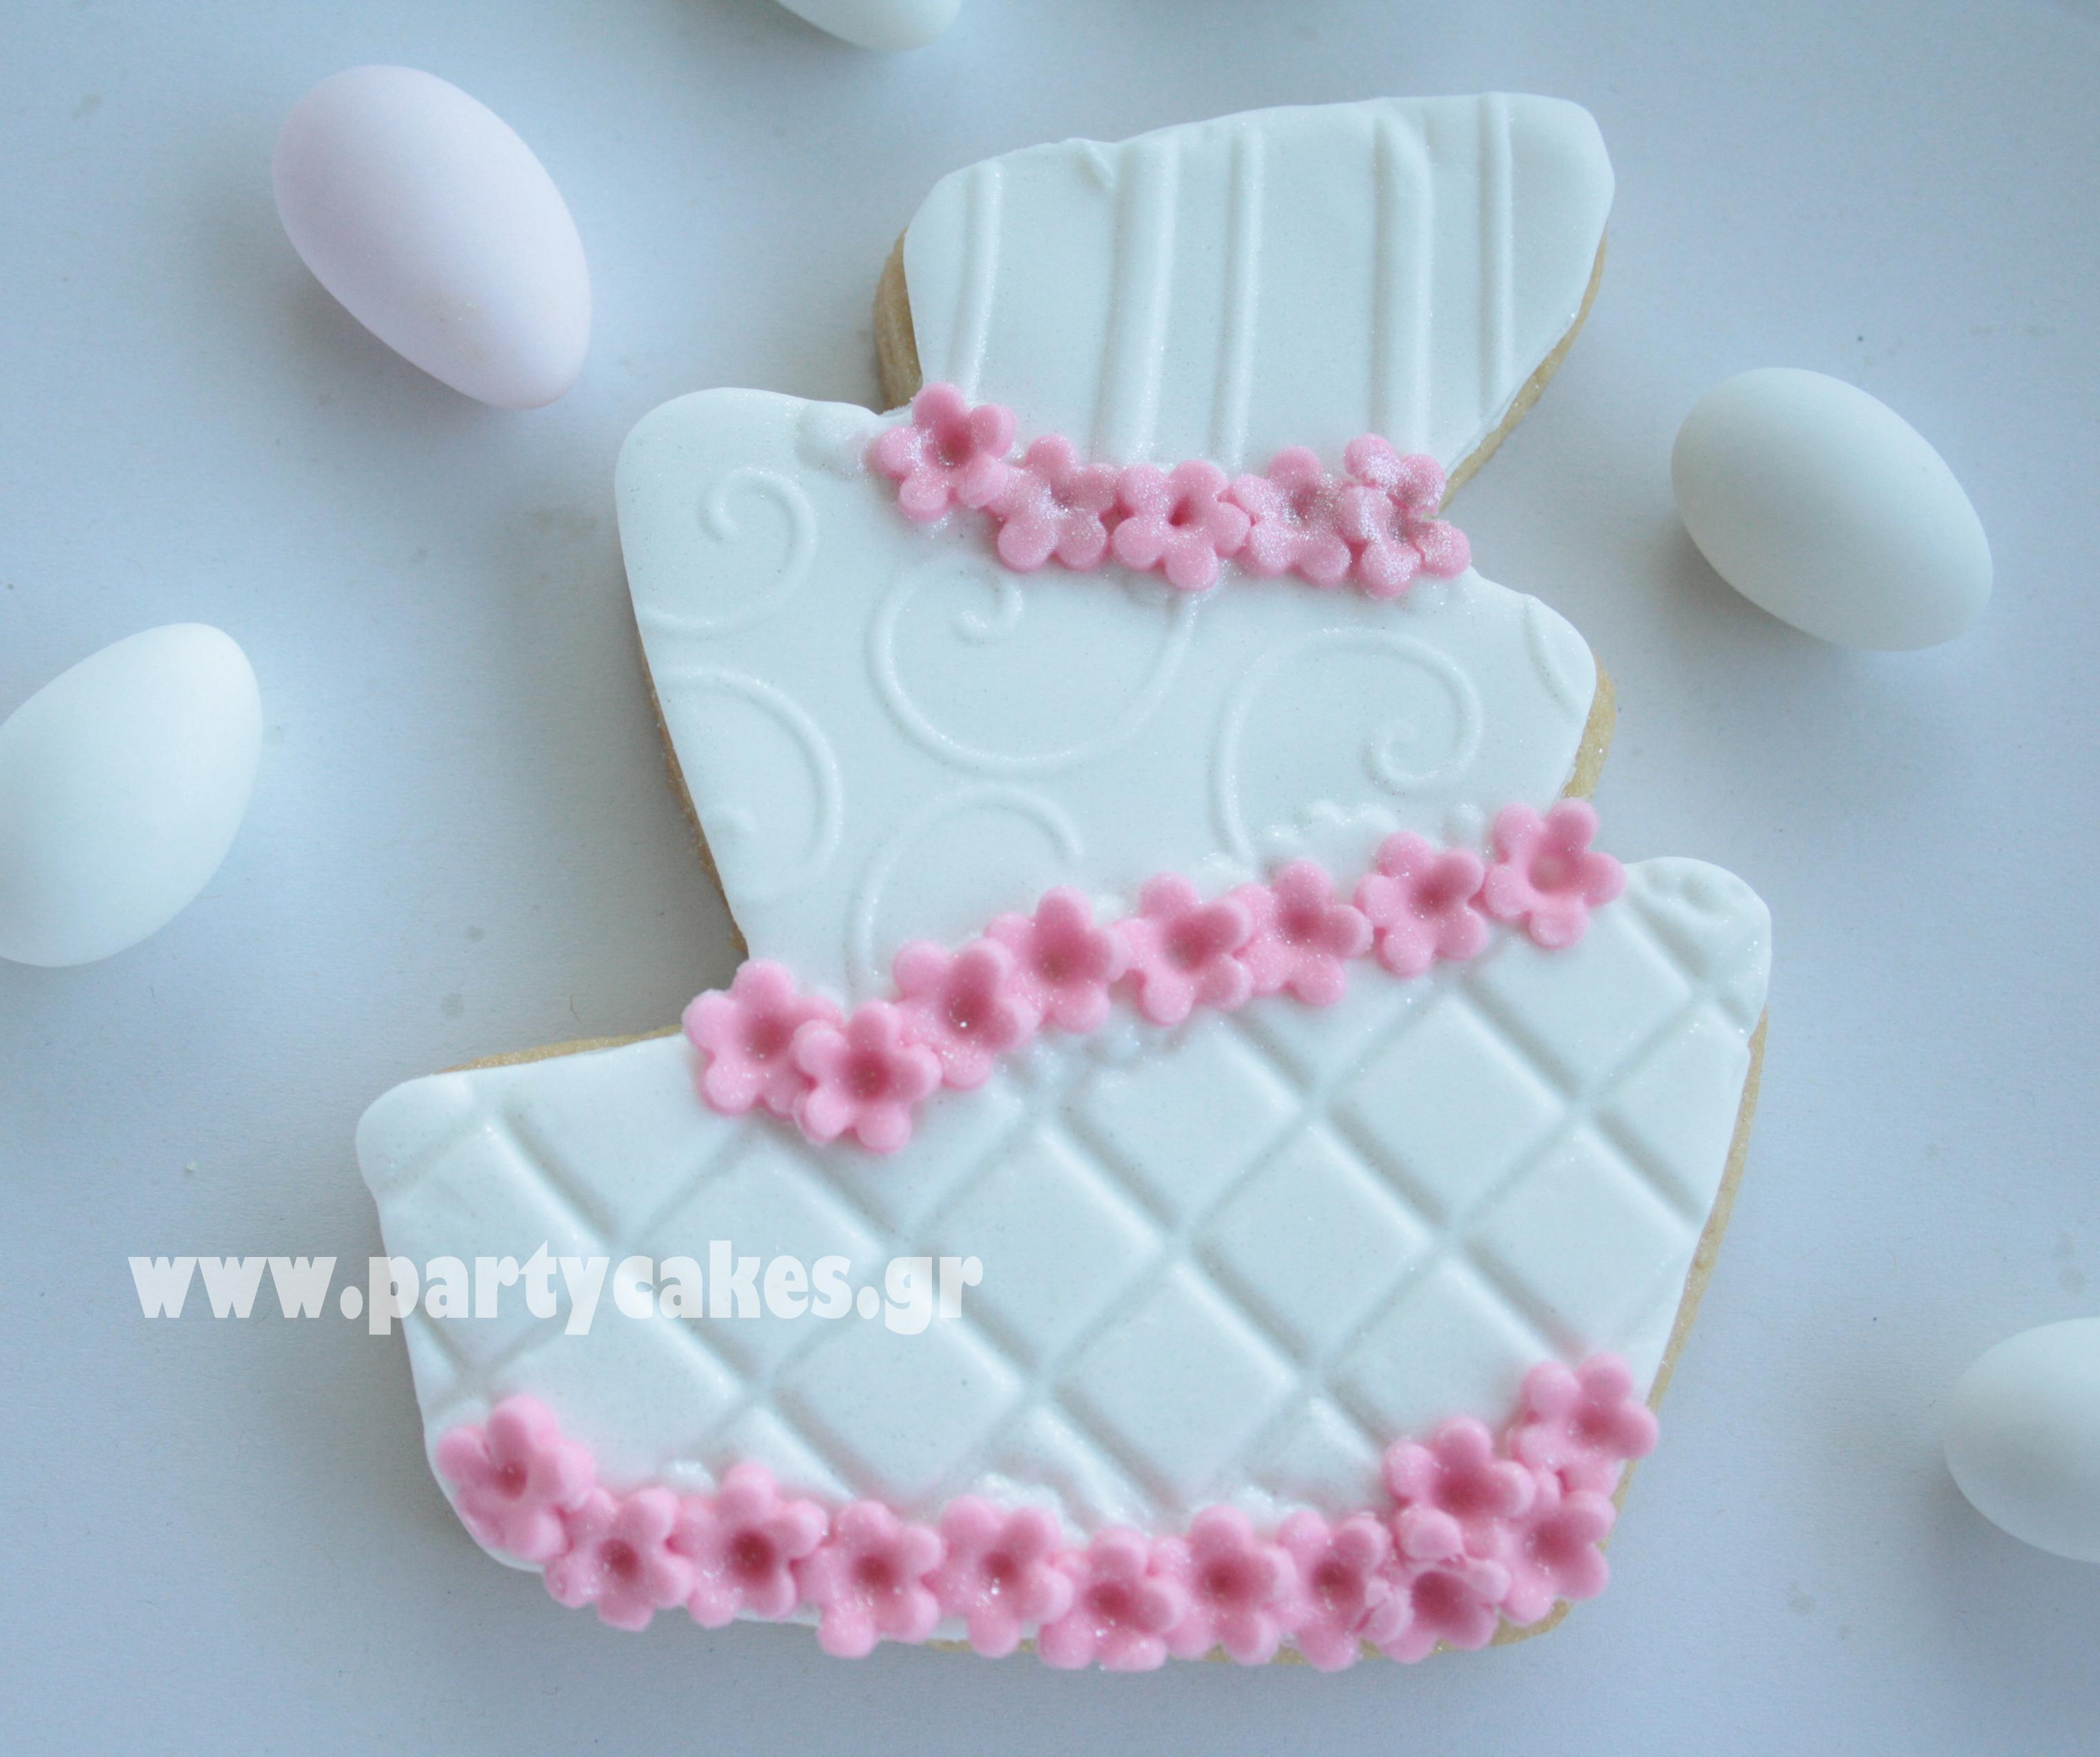 wedding+cake+cookie+3+copy.jpg